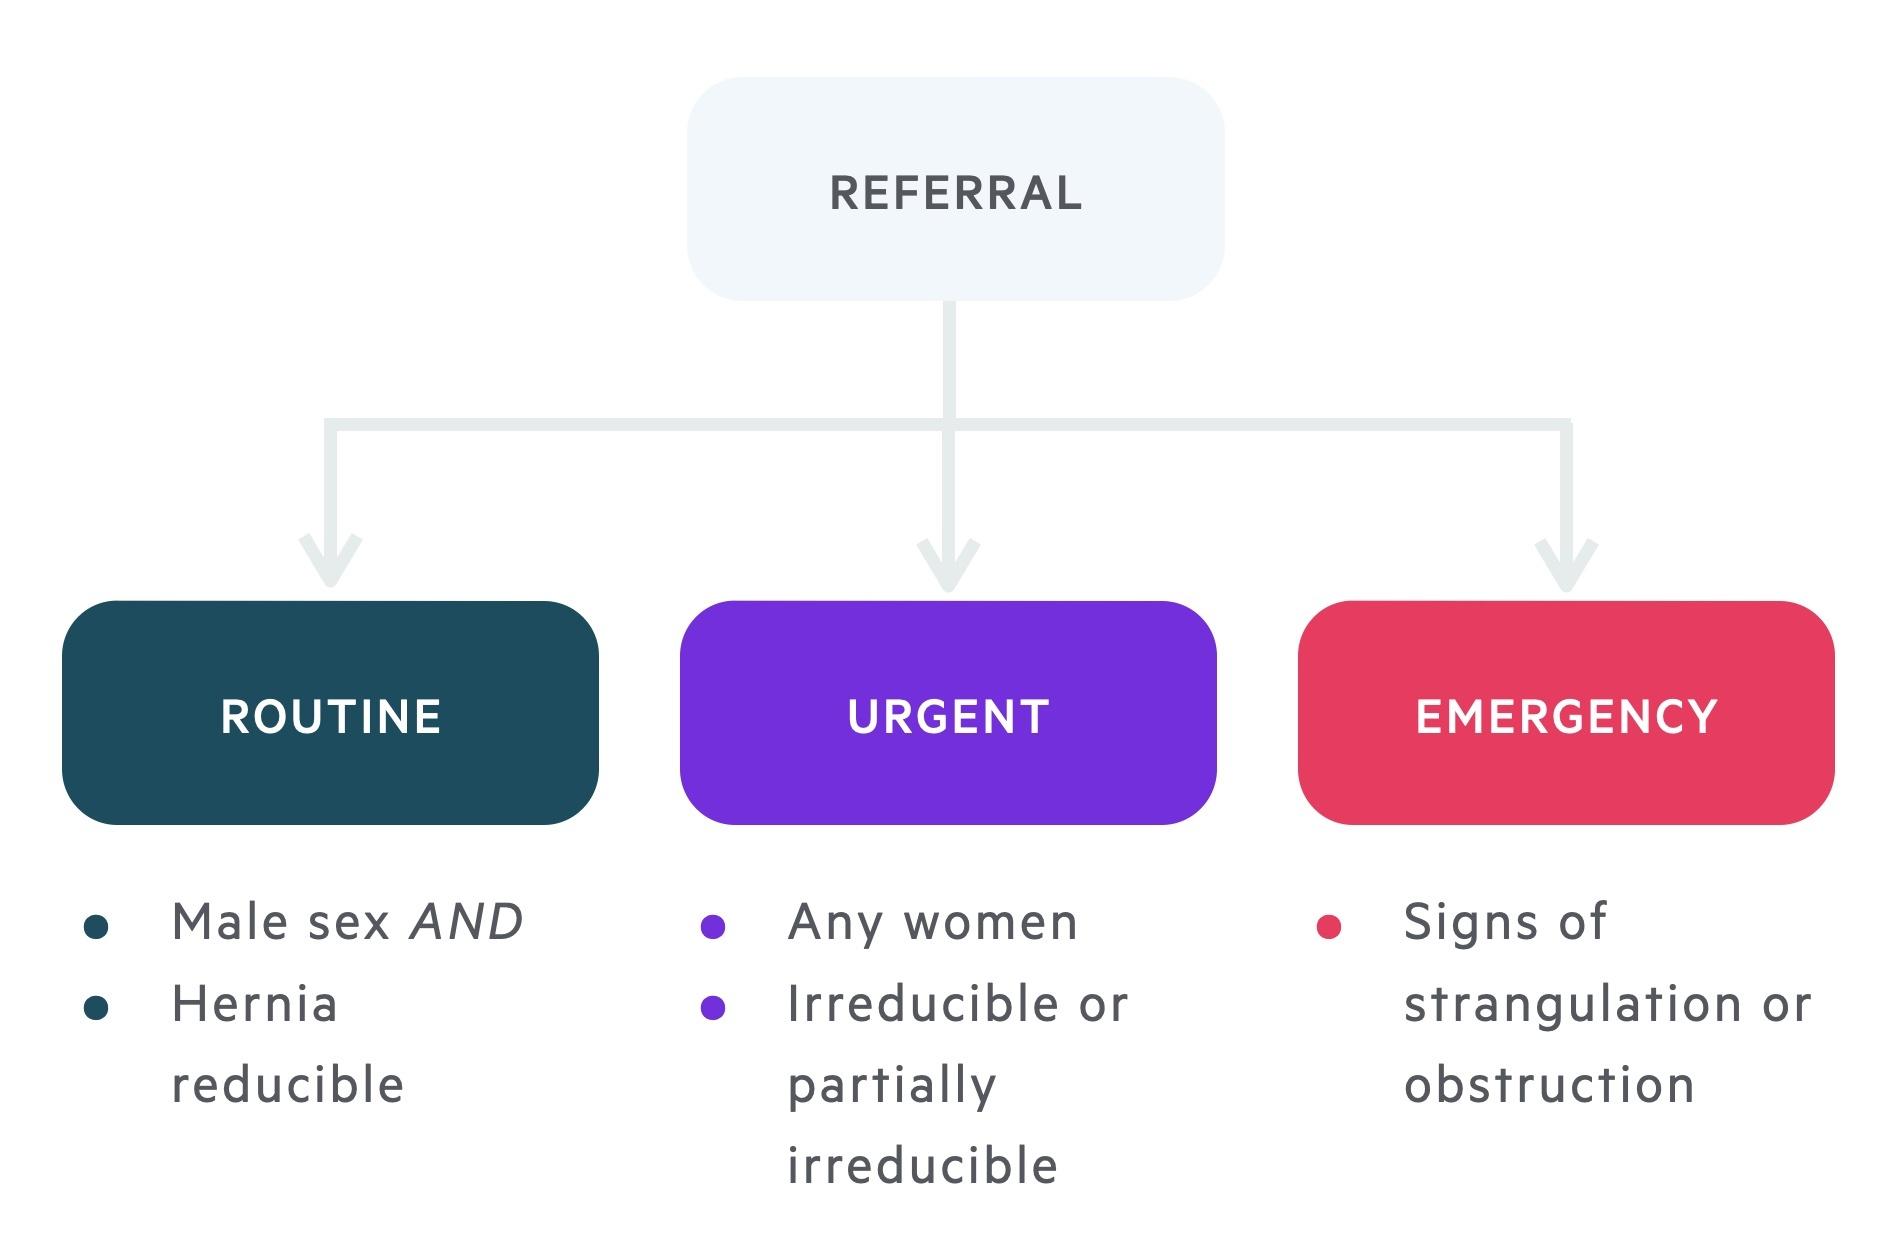 Referral criteria for inguinal hernia